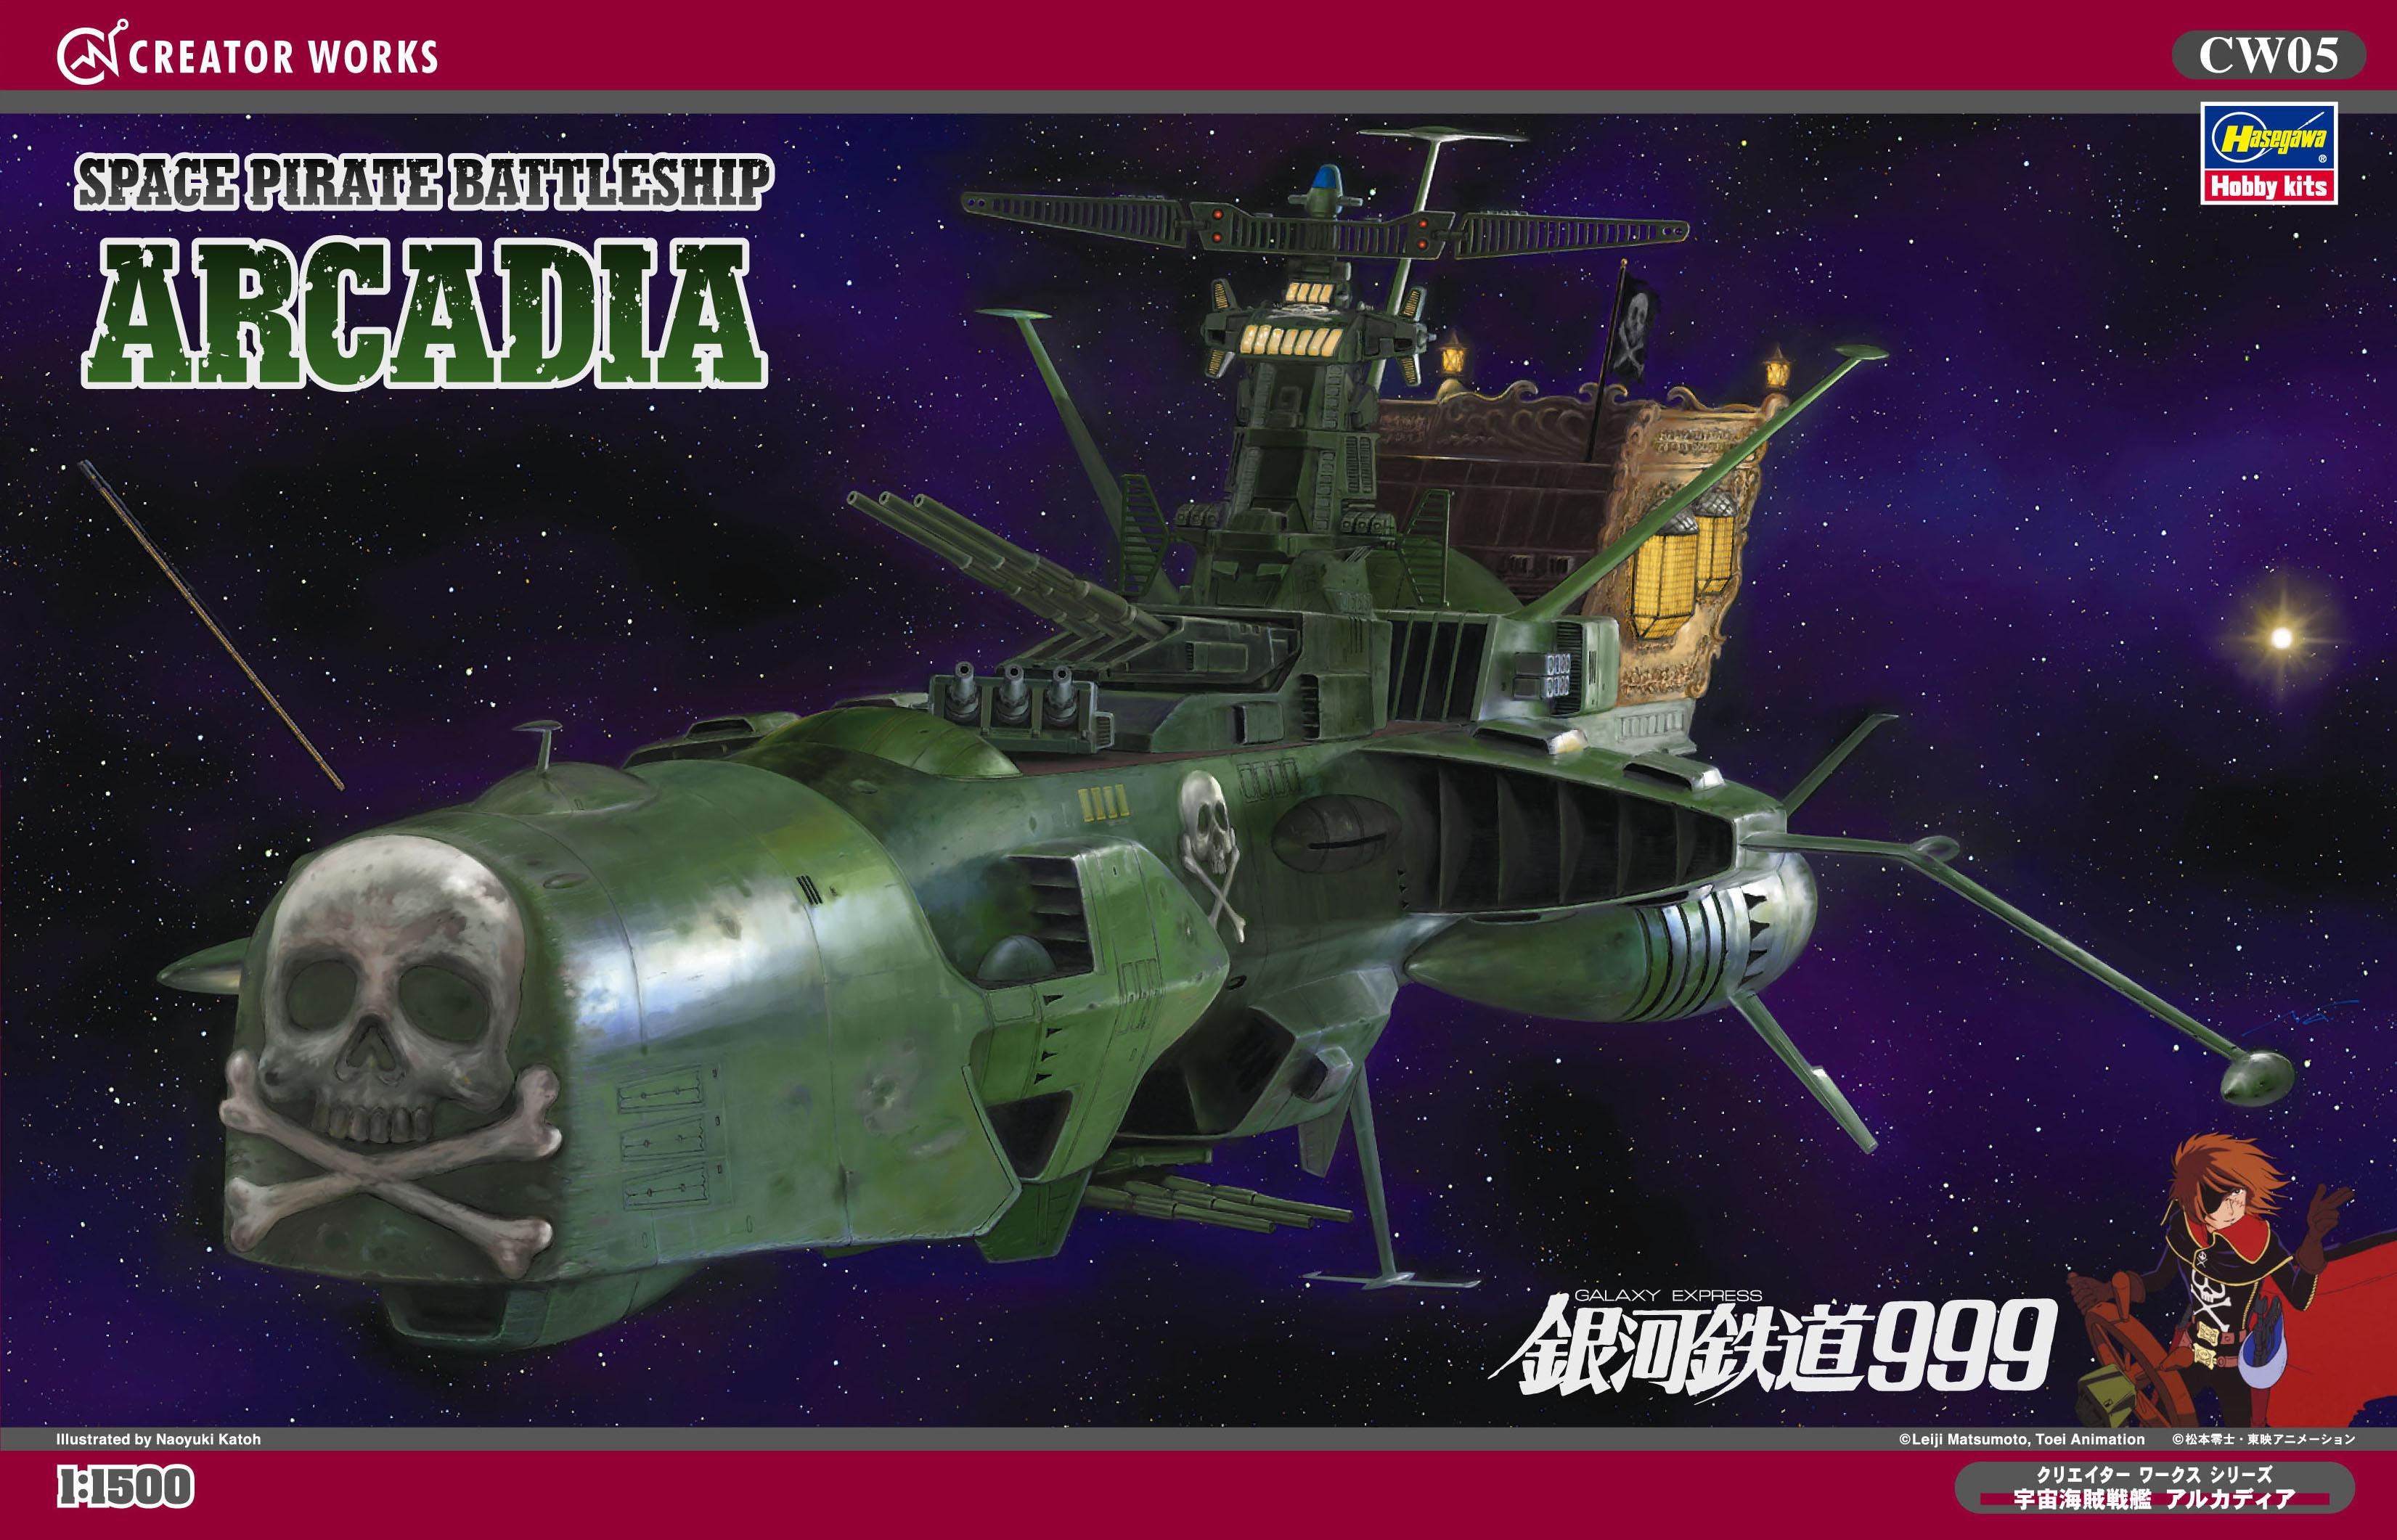 Hasegawa Space Pirate Battleship Arcadia